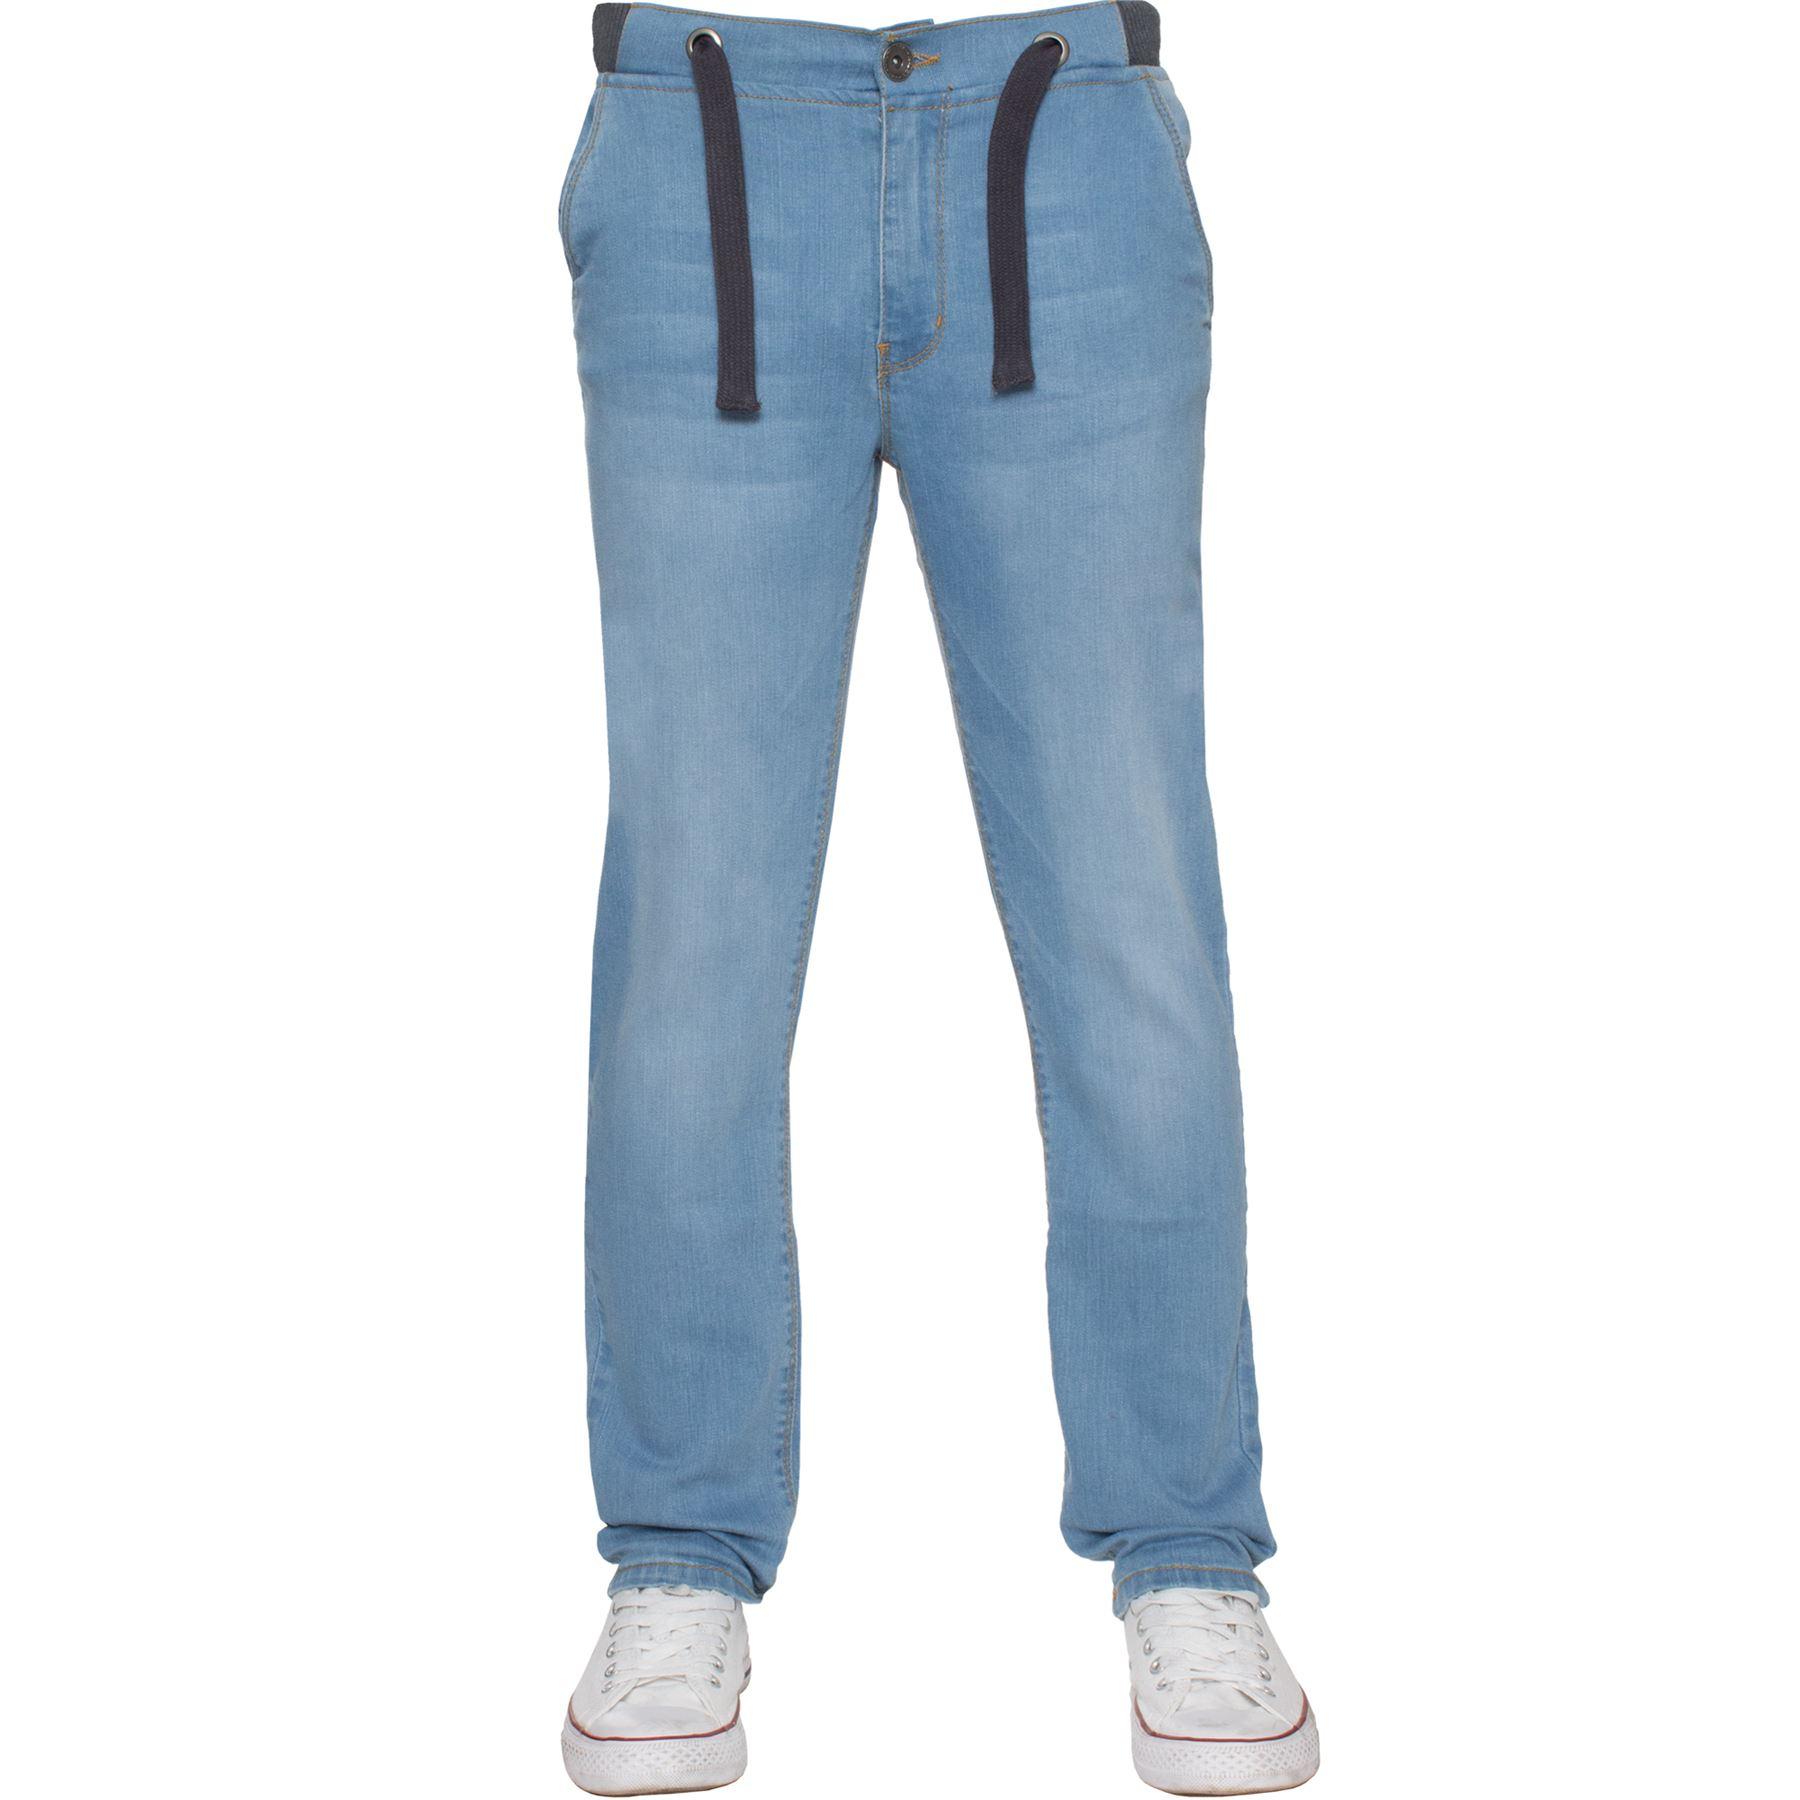 Jean-Garcon-Taille-Elastique-Enfants-Skinny-Stretch-School-Denim-Pantalon-Pantalon miniature 15